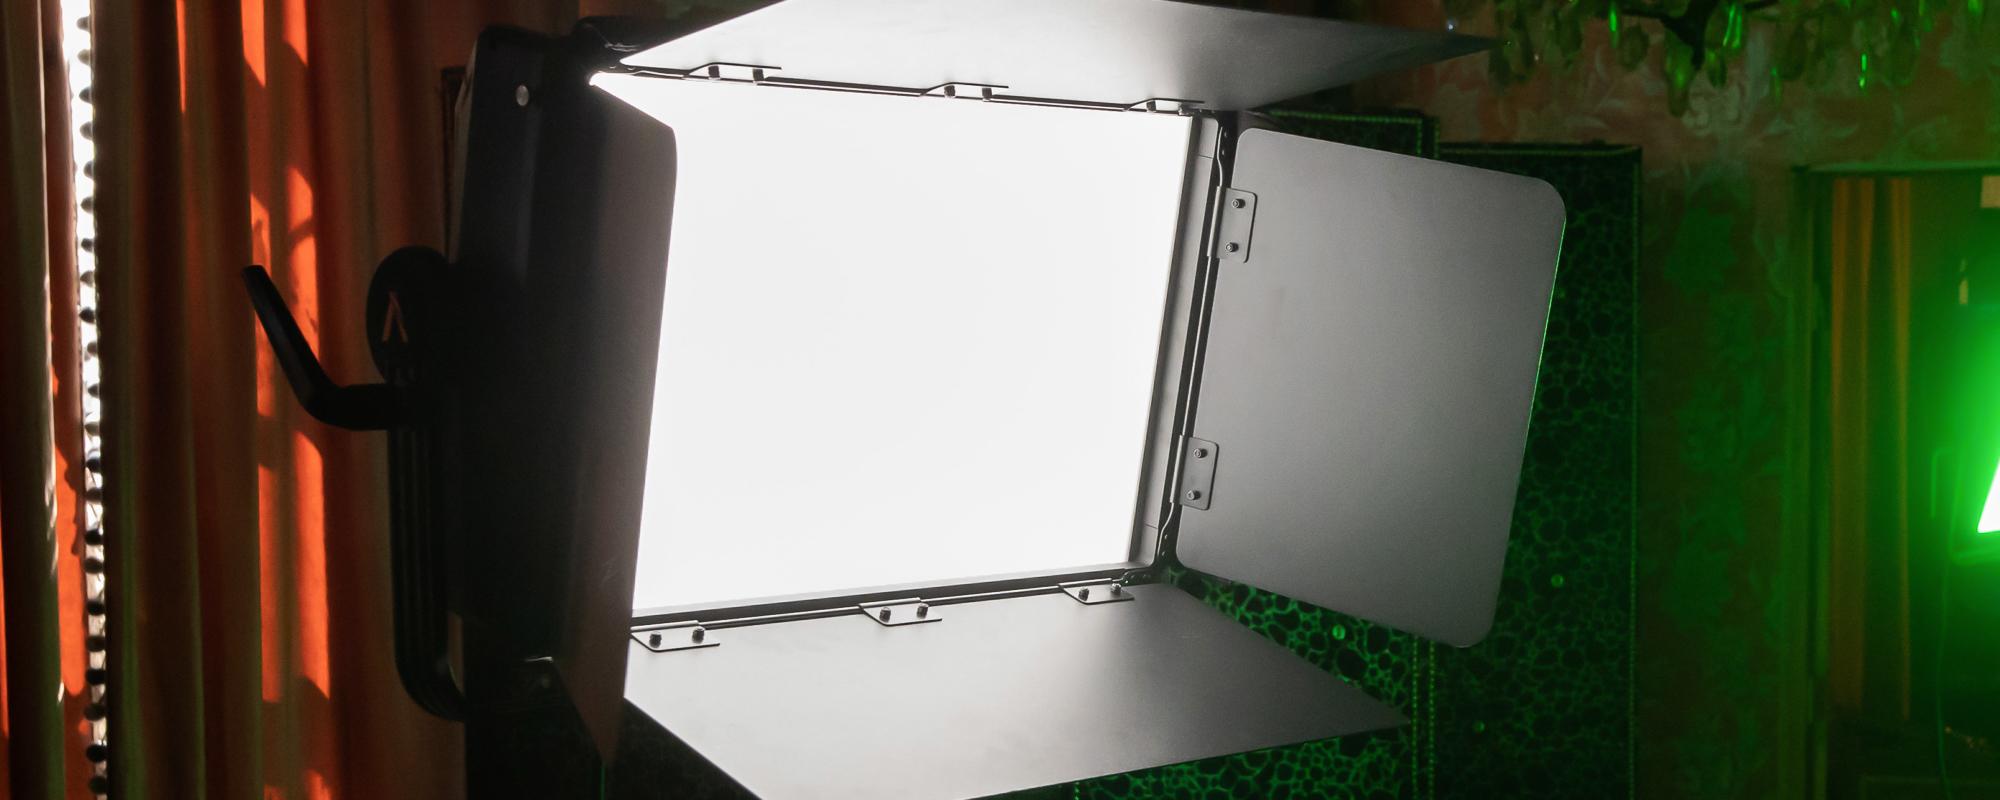 Wrota Aputure Nova Barn Doors - kontrolna nad światłem